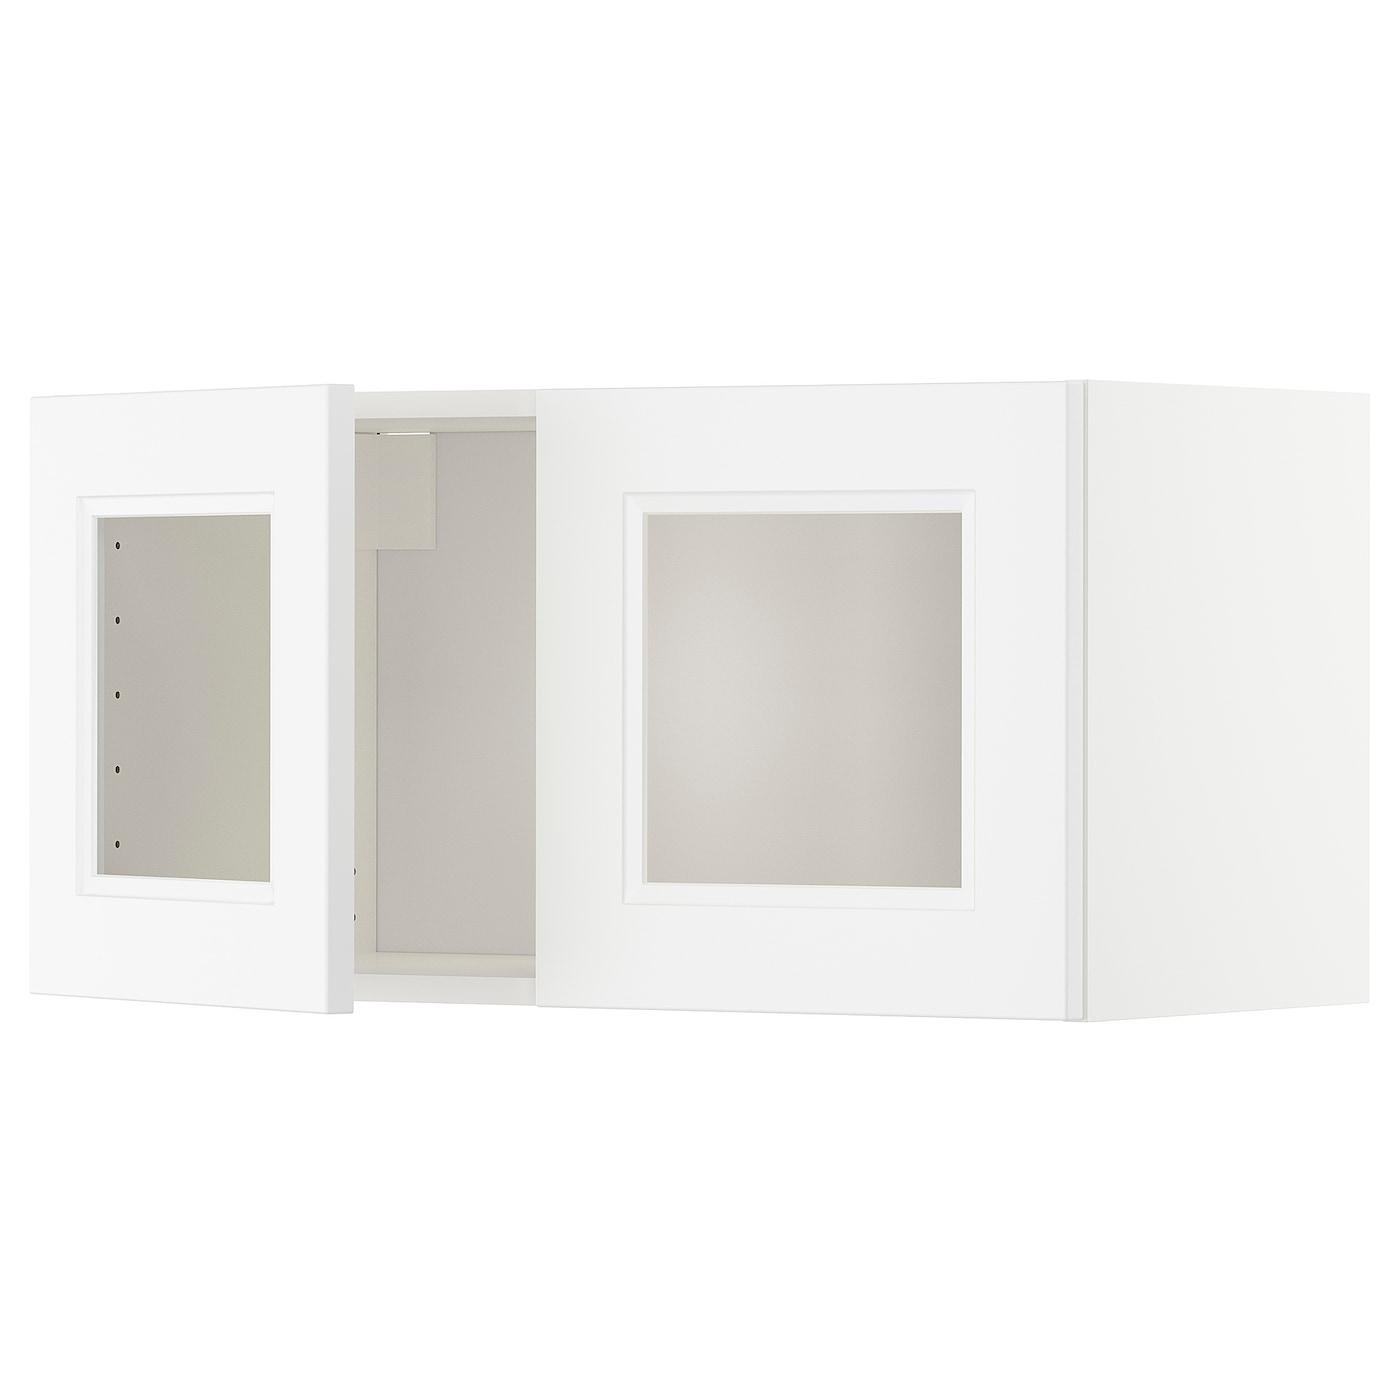 Metod Wall Cabinet With 2 Glass Doors Whiteaxstad Matt White 80 X